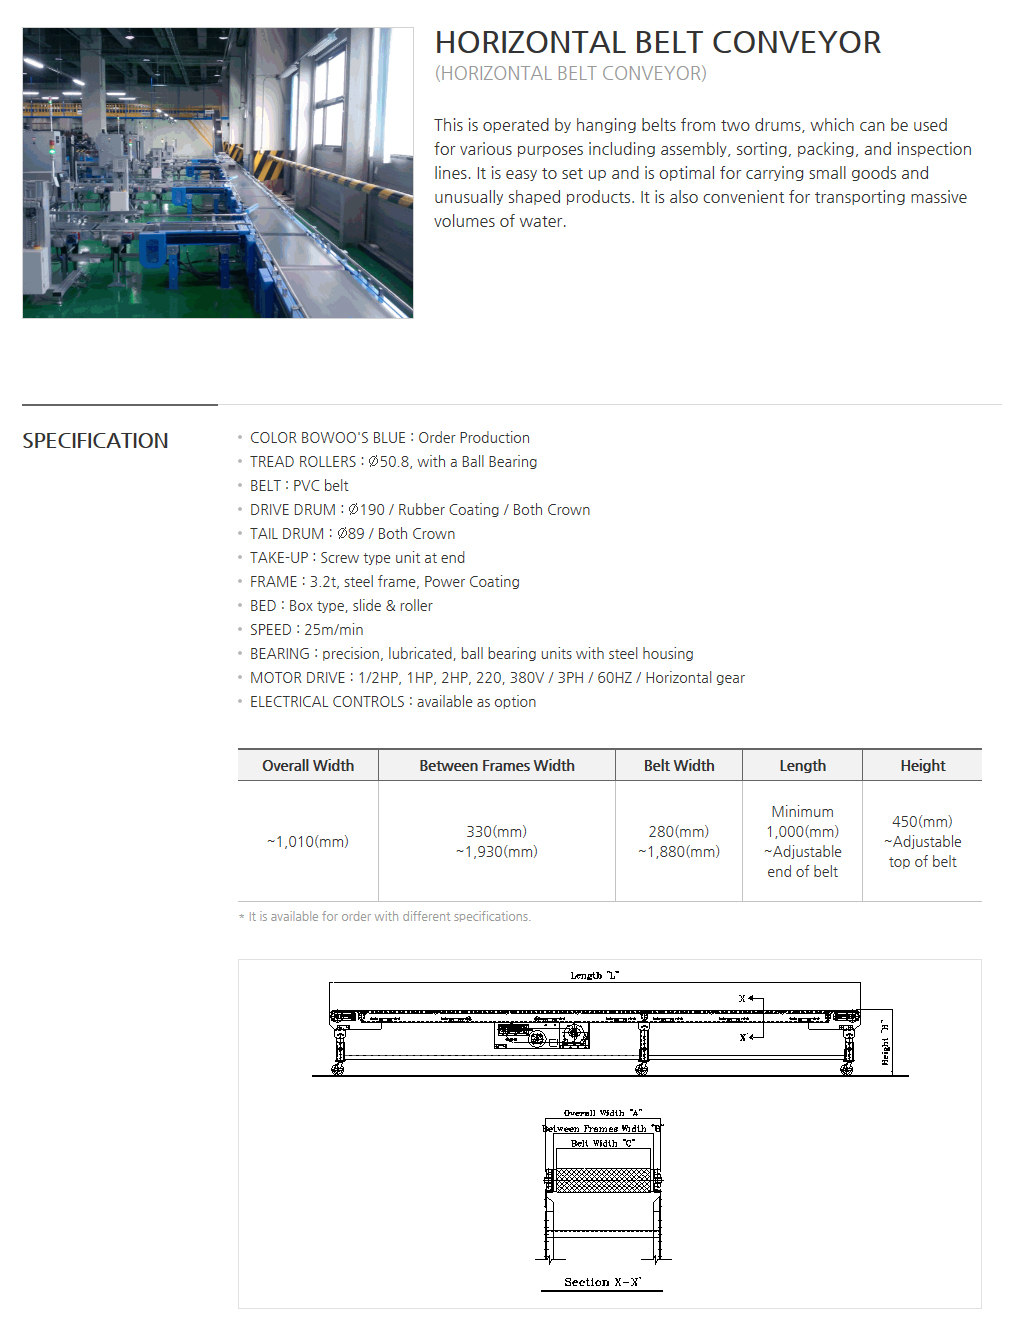 BOWOOSYSTEM Power Conveyor : Horizontal Belt Conveyor